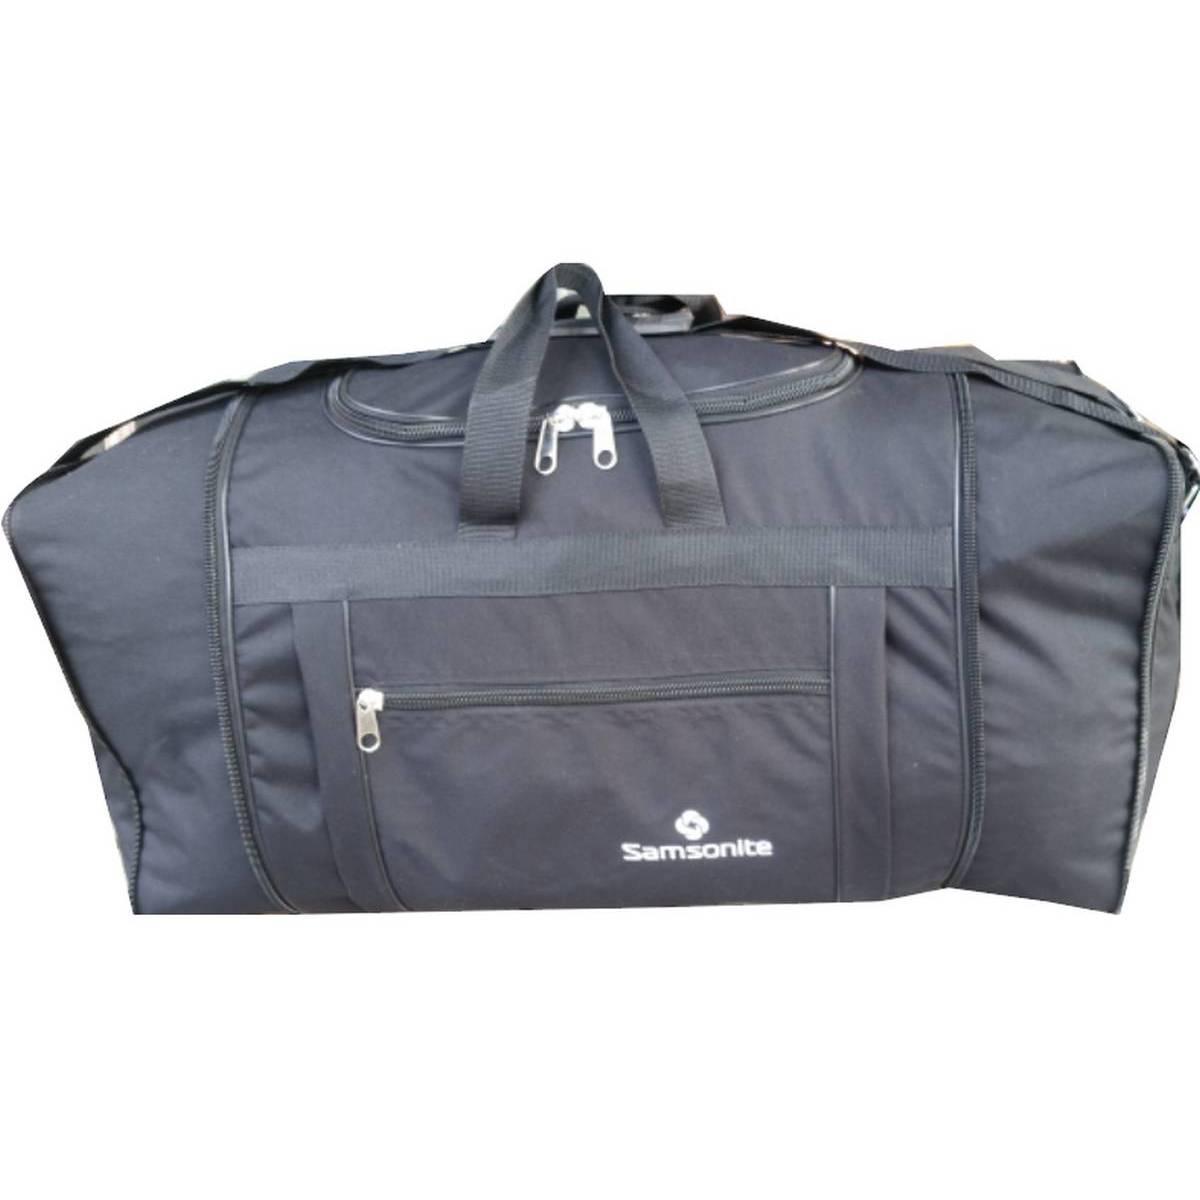 Travel Luggage Storage Bag Large Capacity Clothes Blanket Organizer Bags